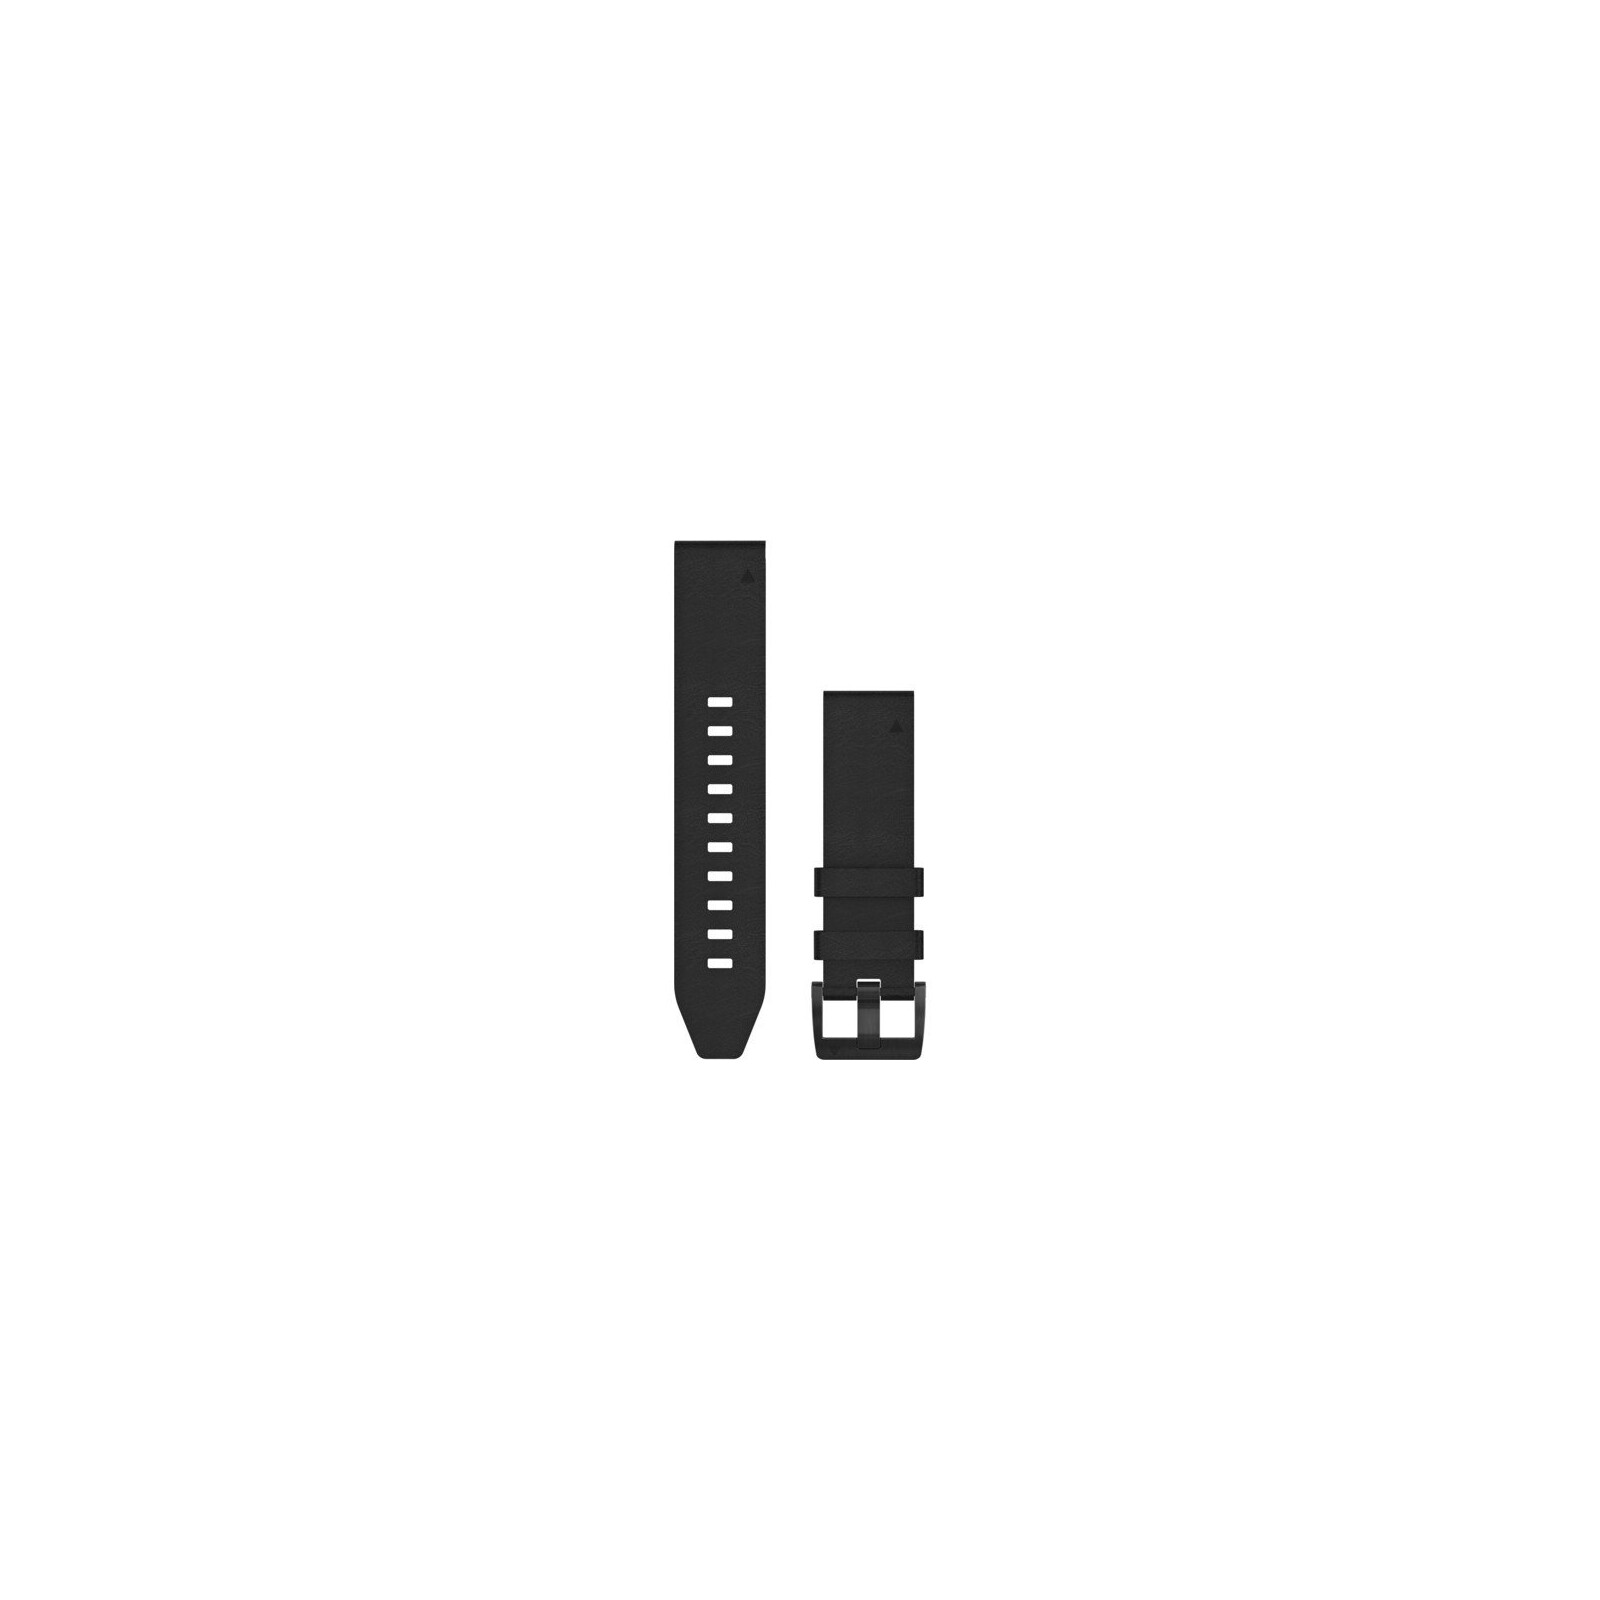 Garmin QuickFit 22 Uhrenband Leder Schwarz